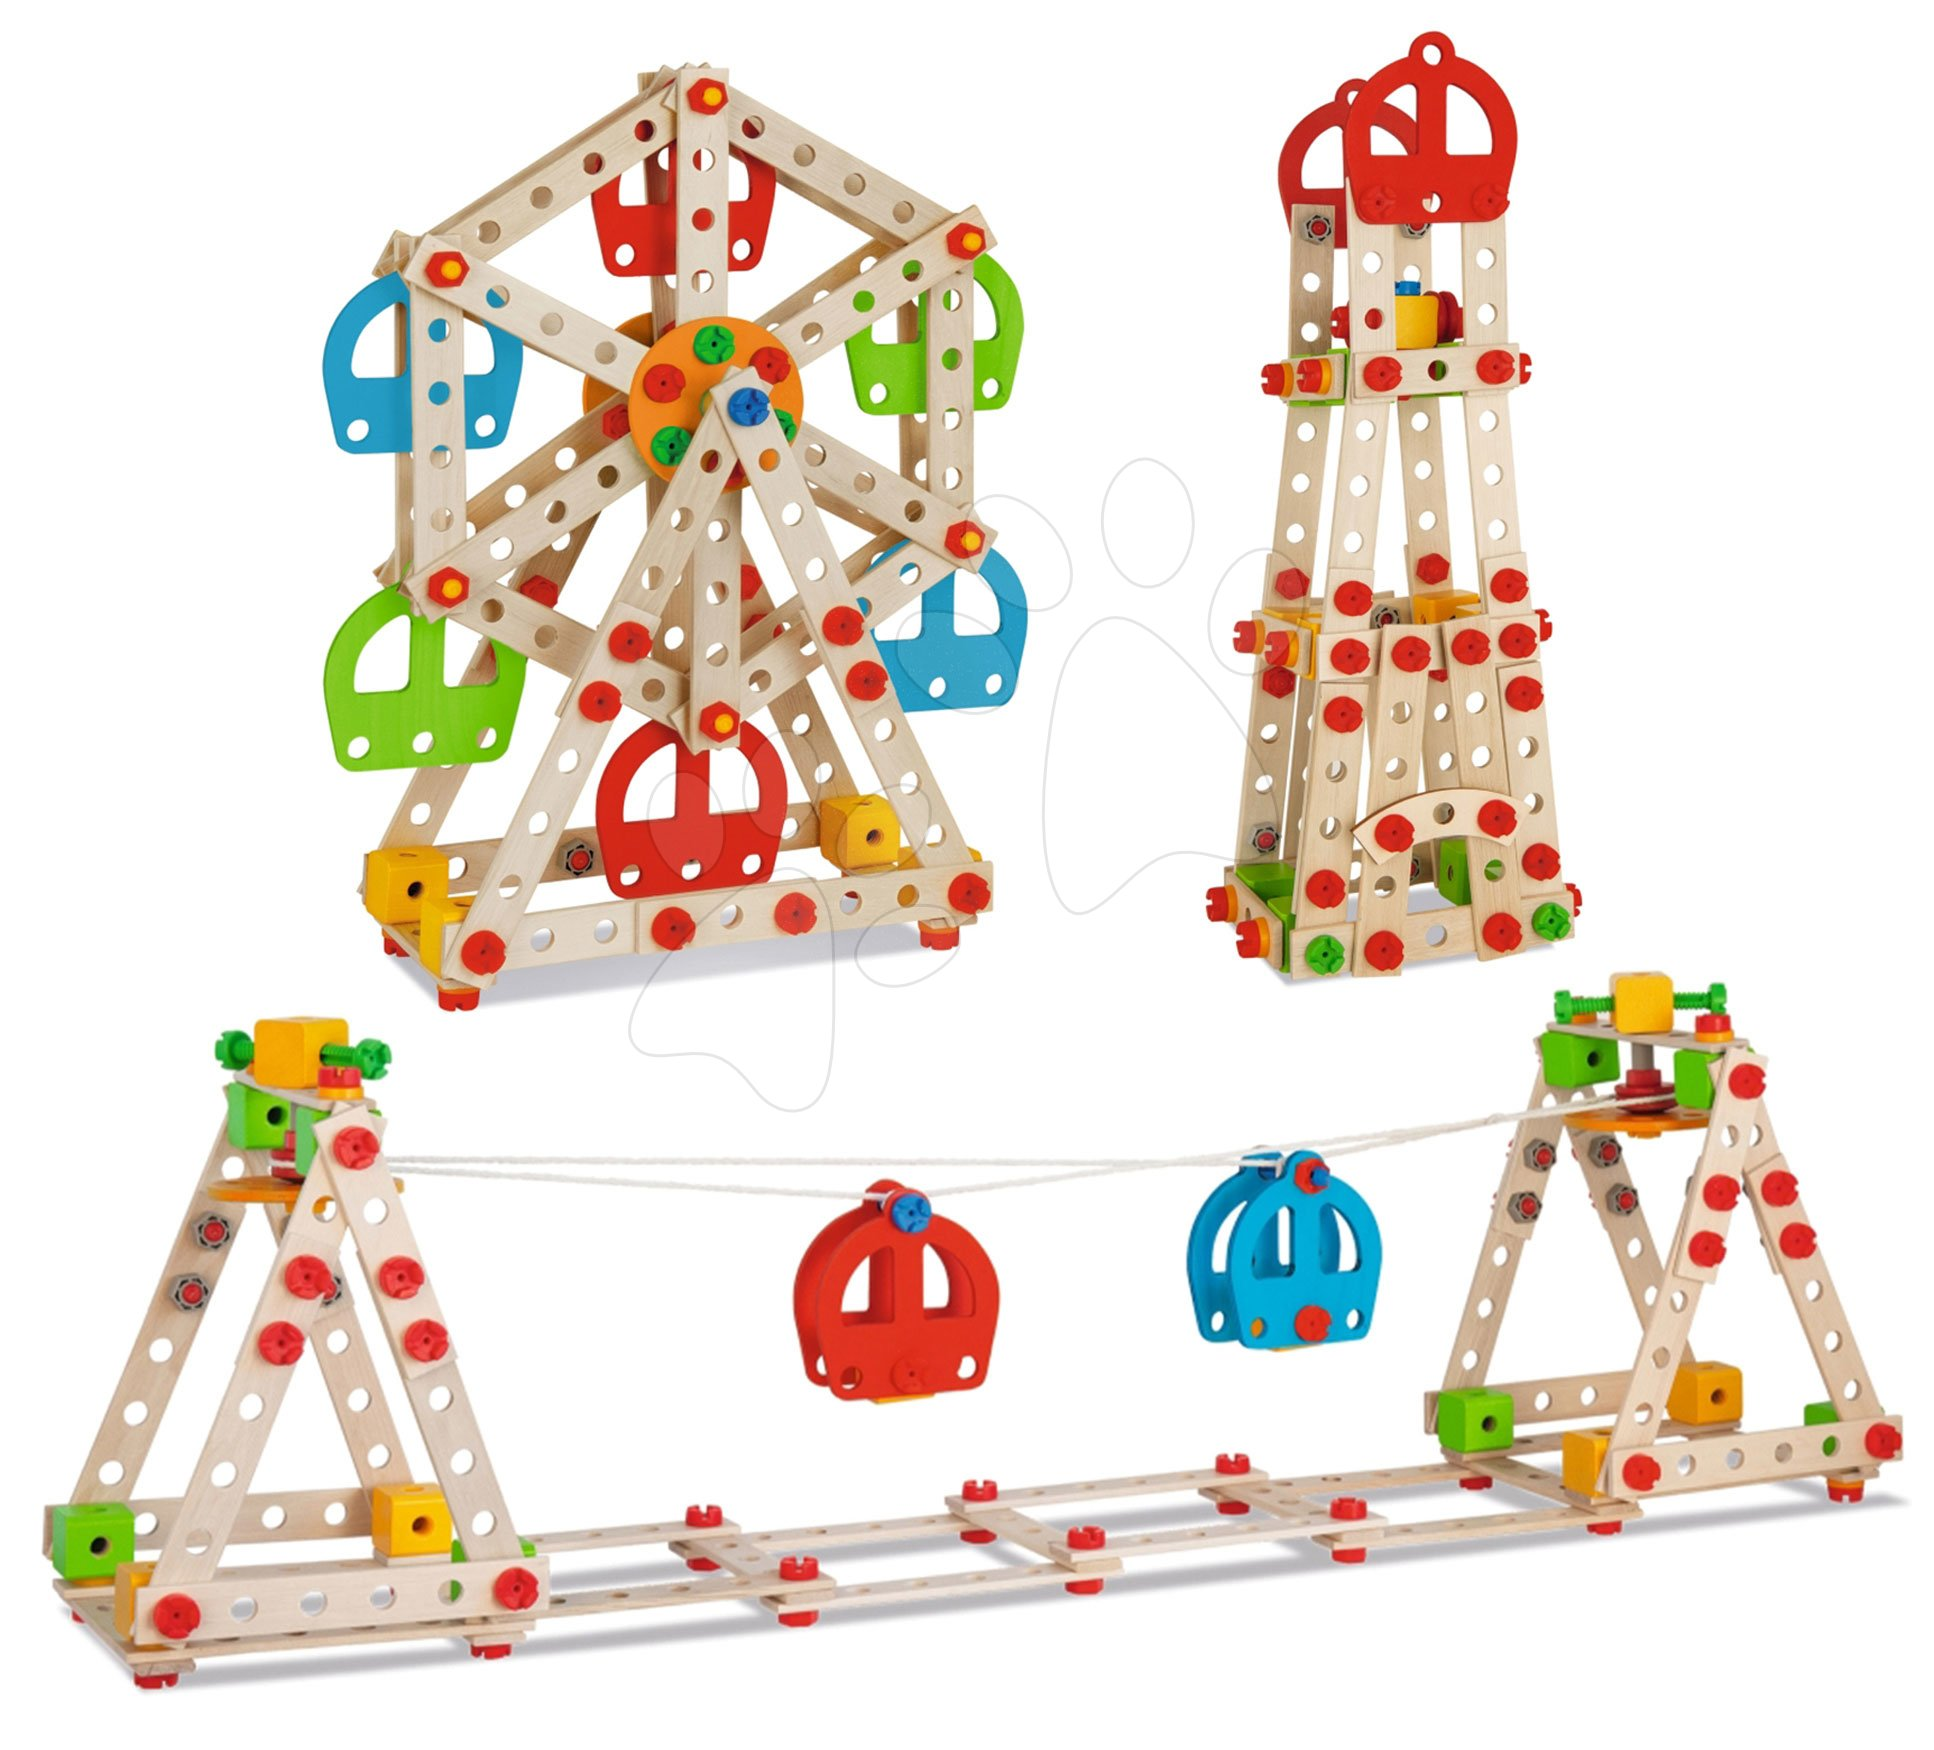 Joc de construit din lemn parc de distractii Constructor Big Wheel Eichhorn 3 modele (parc de distractii, far, telecabină) 240 piese de la 6 ani